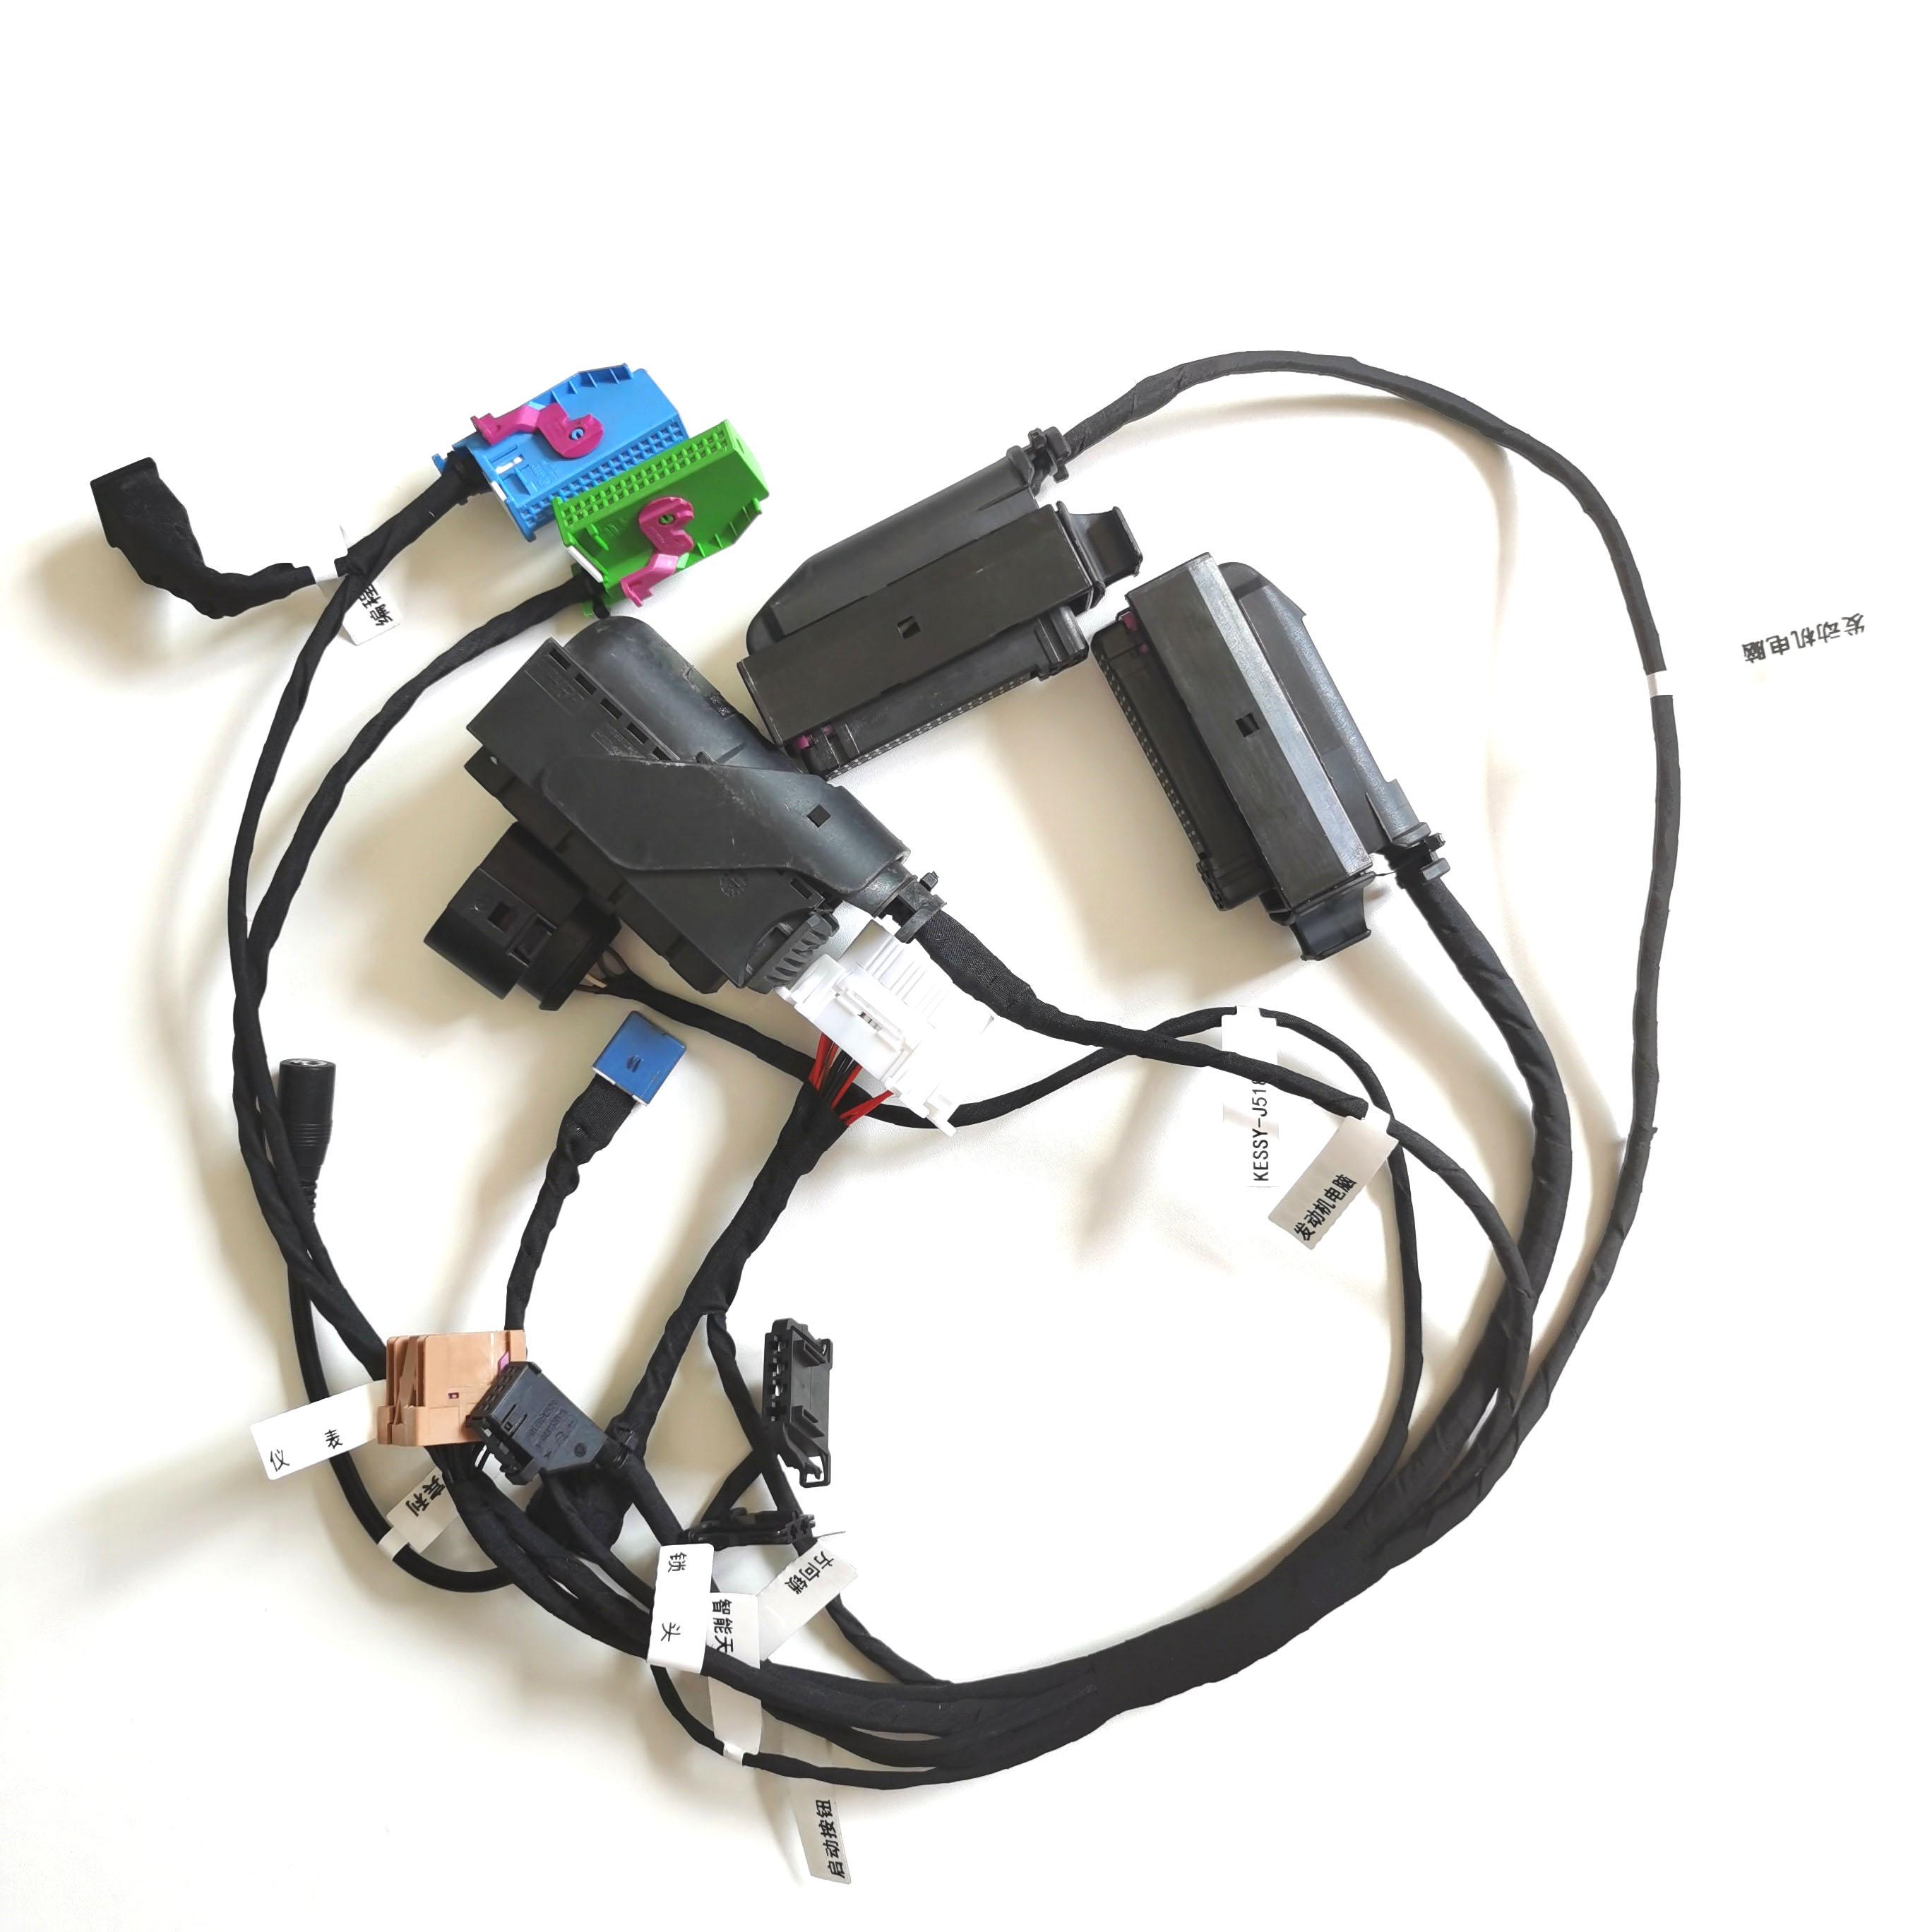 Universal Test Platform Cable for  4th Kessy box immobilizer - Volkswagen Touareg, Bentley, Phaeton